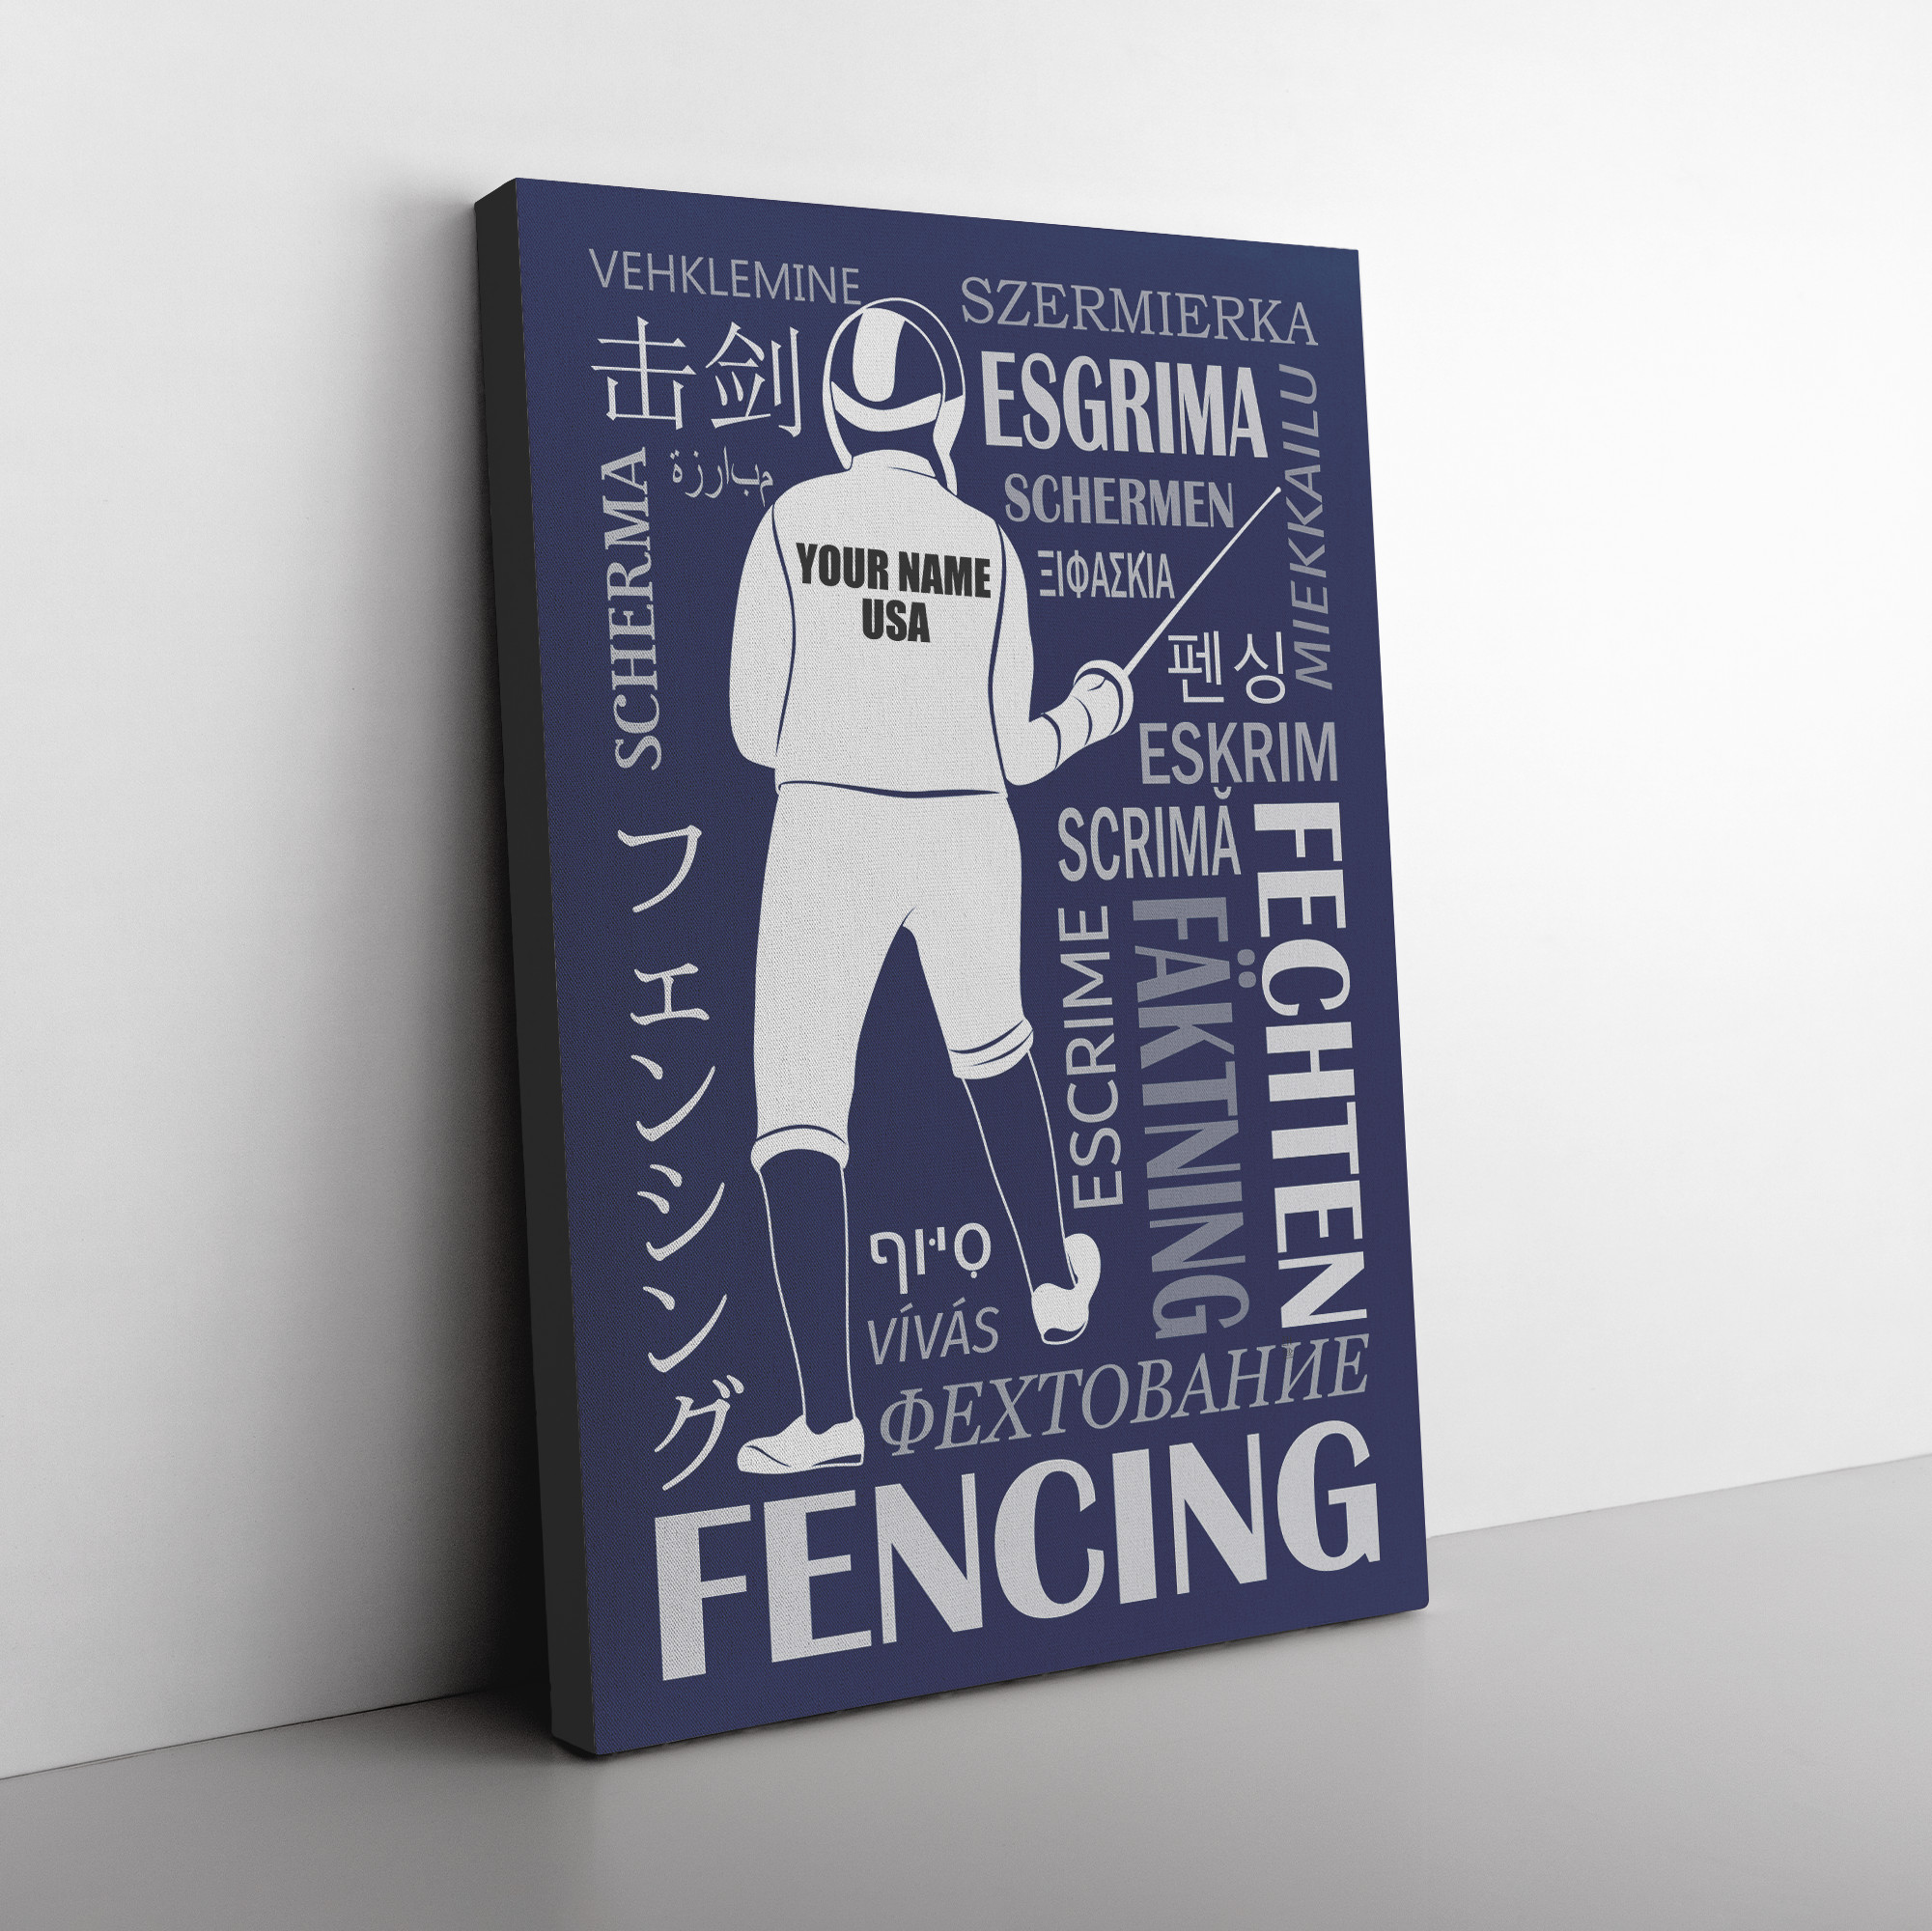 Fencing Wall Art